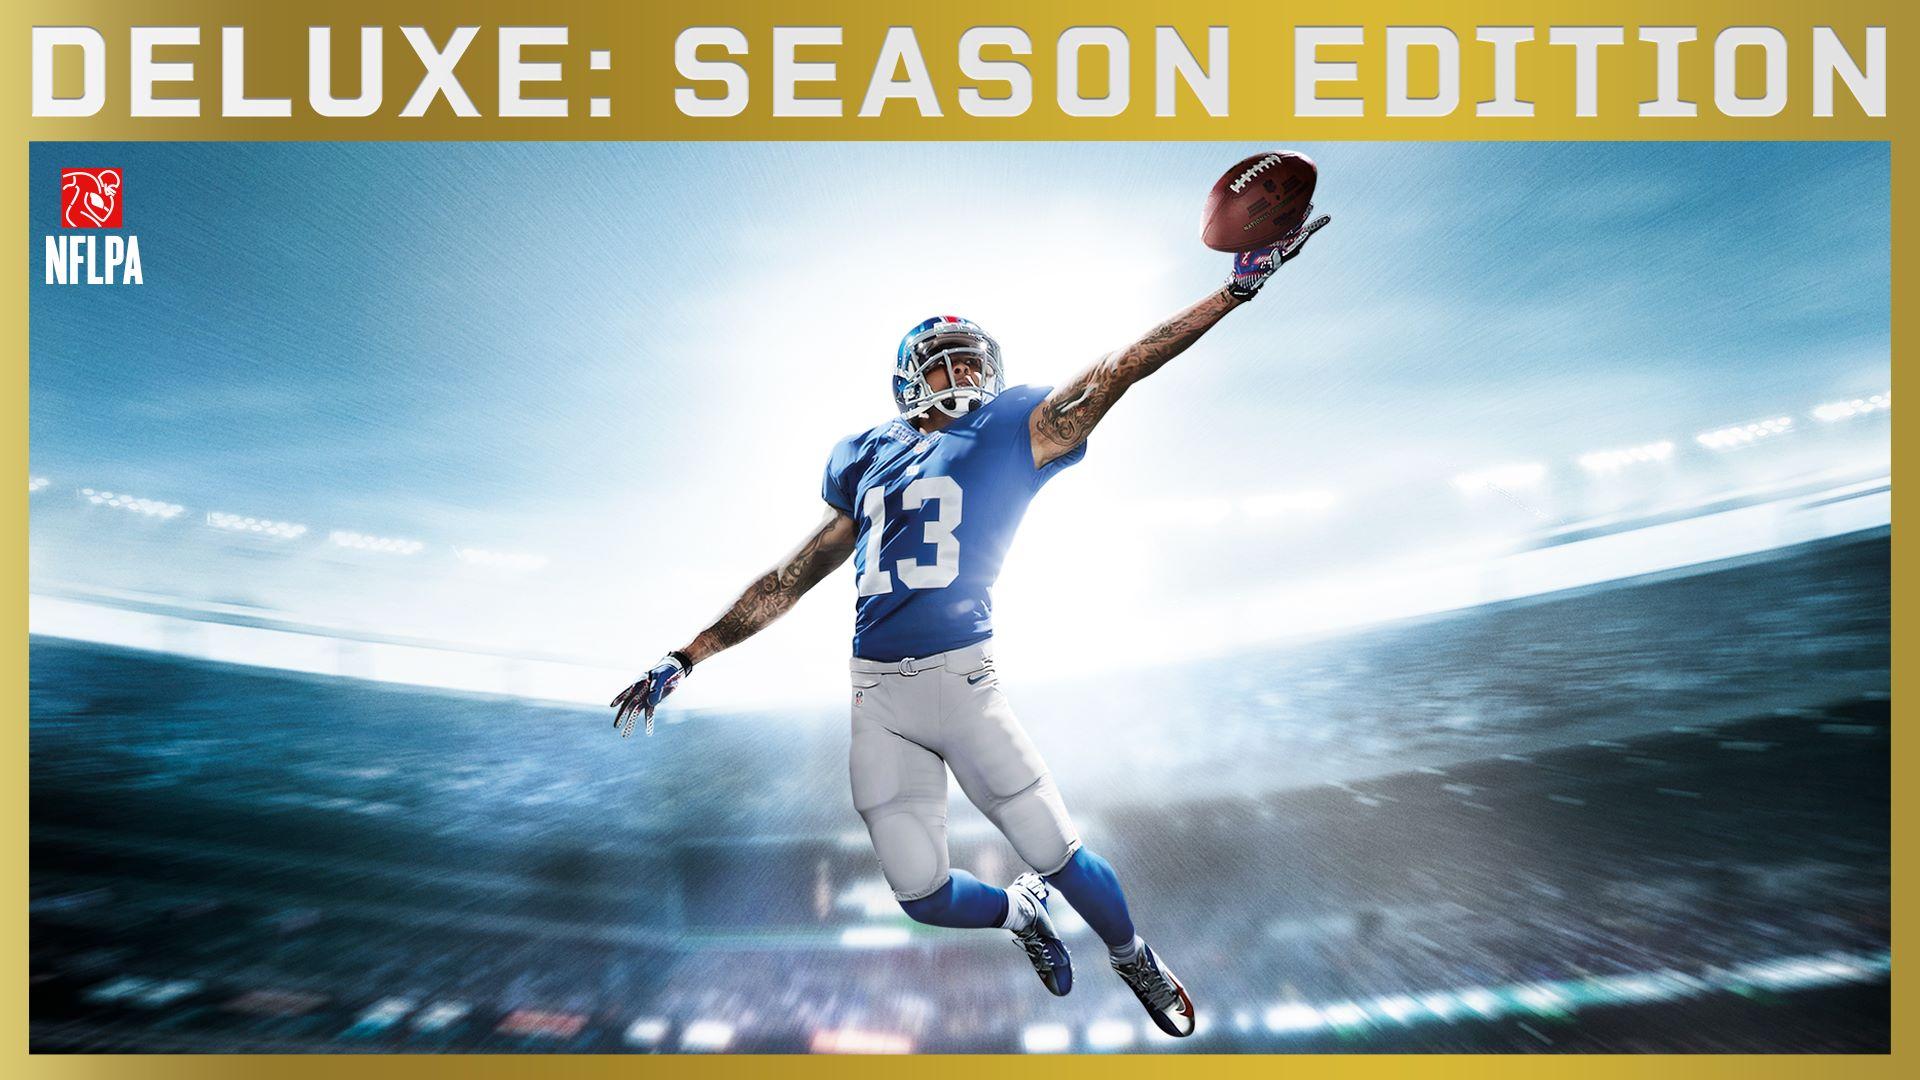 Madden NFL 16 Deluxe: Season Edition